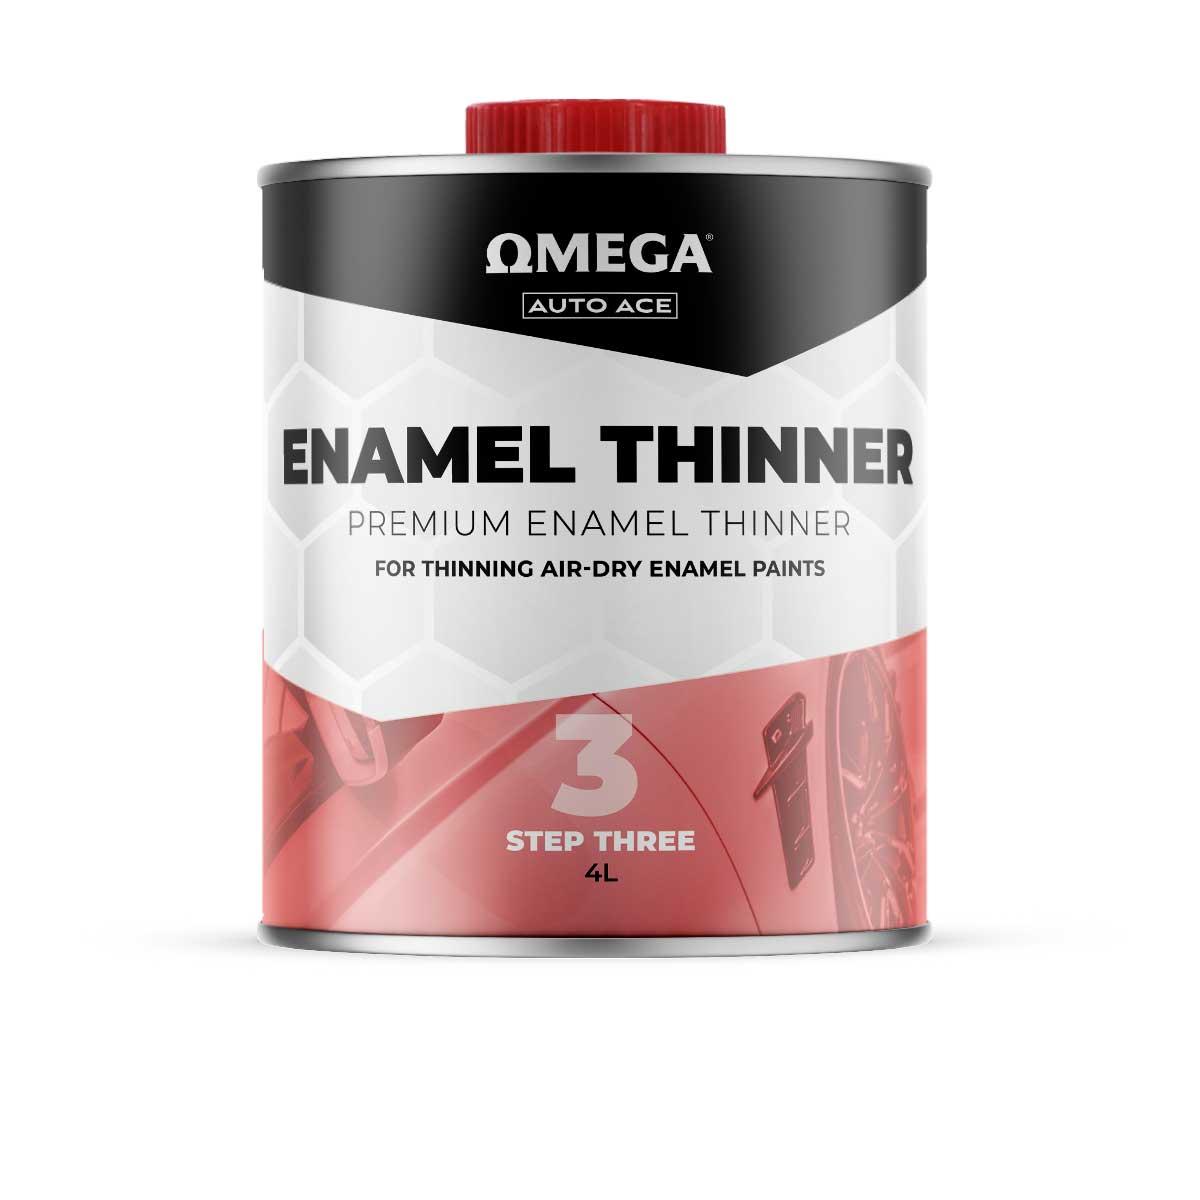 Omega Auto Ace Enamel Thinners 4lt